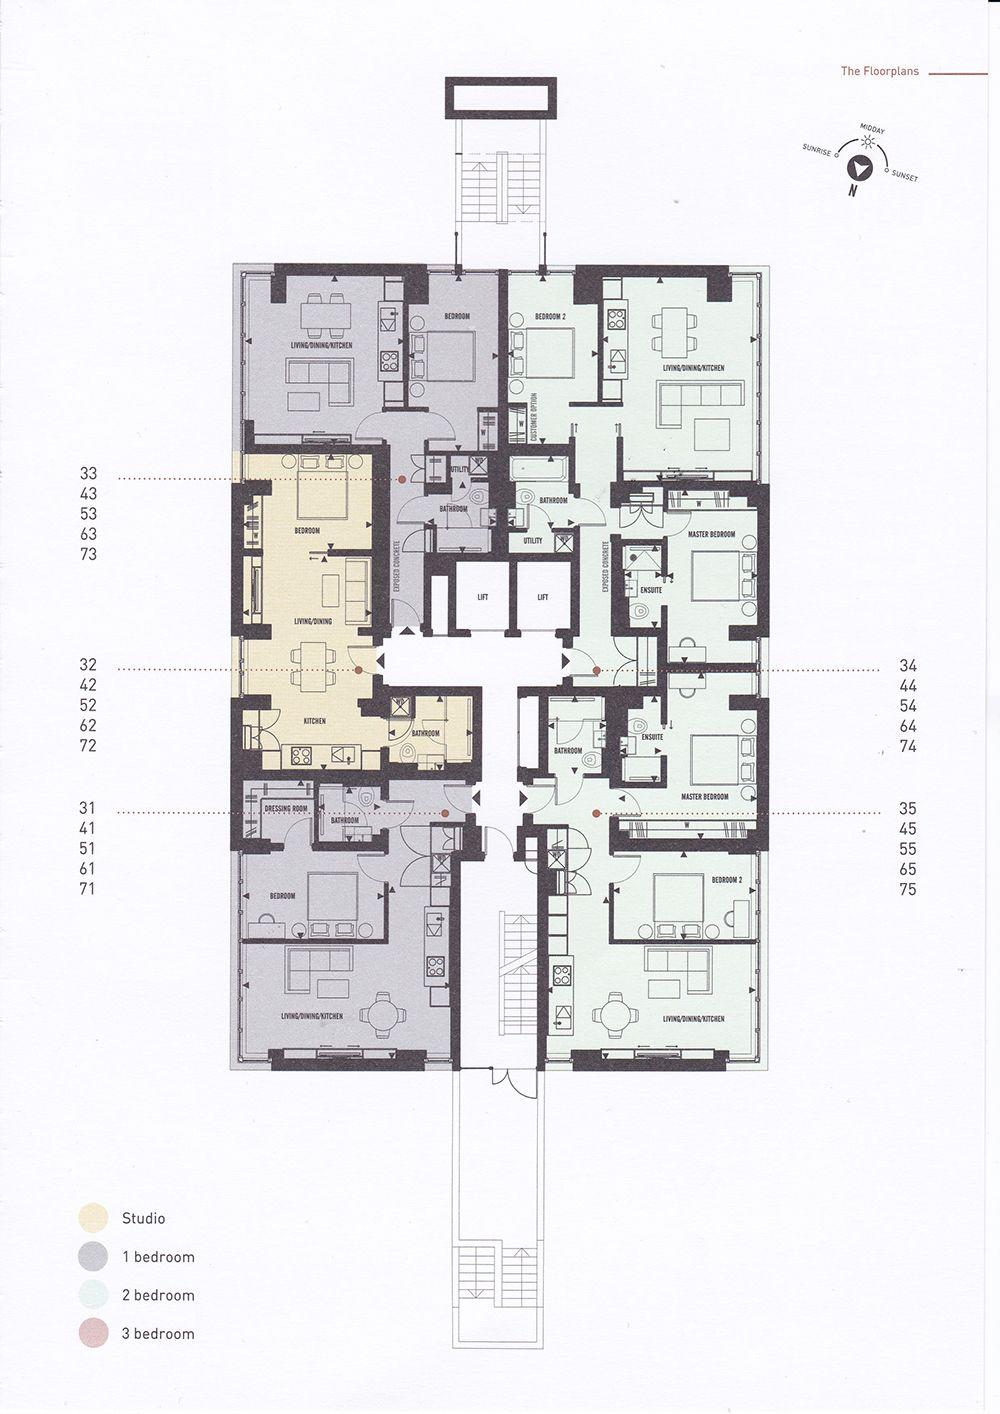 Blake Tower, London, Floor Plan | Castles | Pinterest | Tower and ...